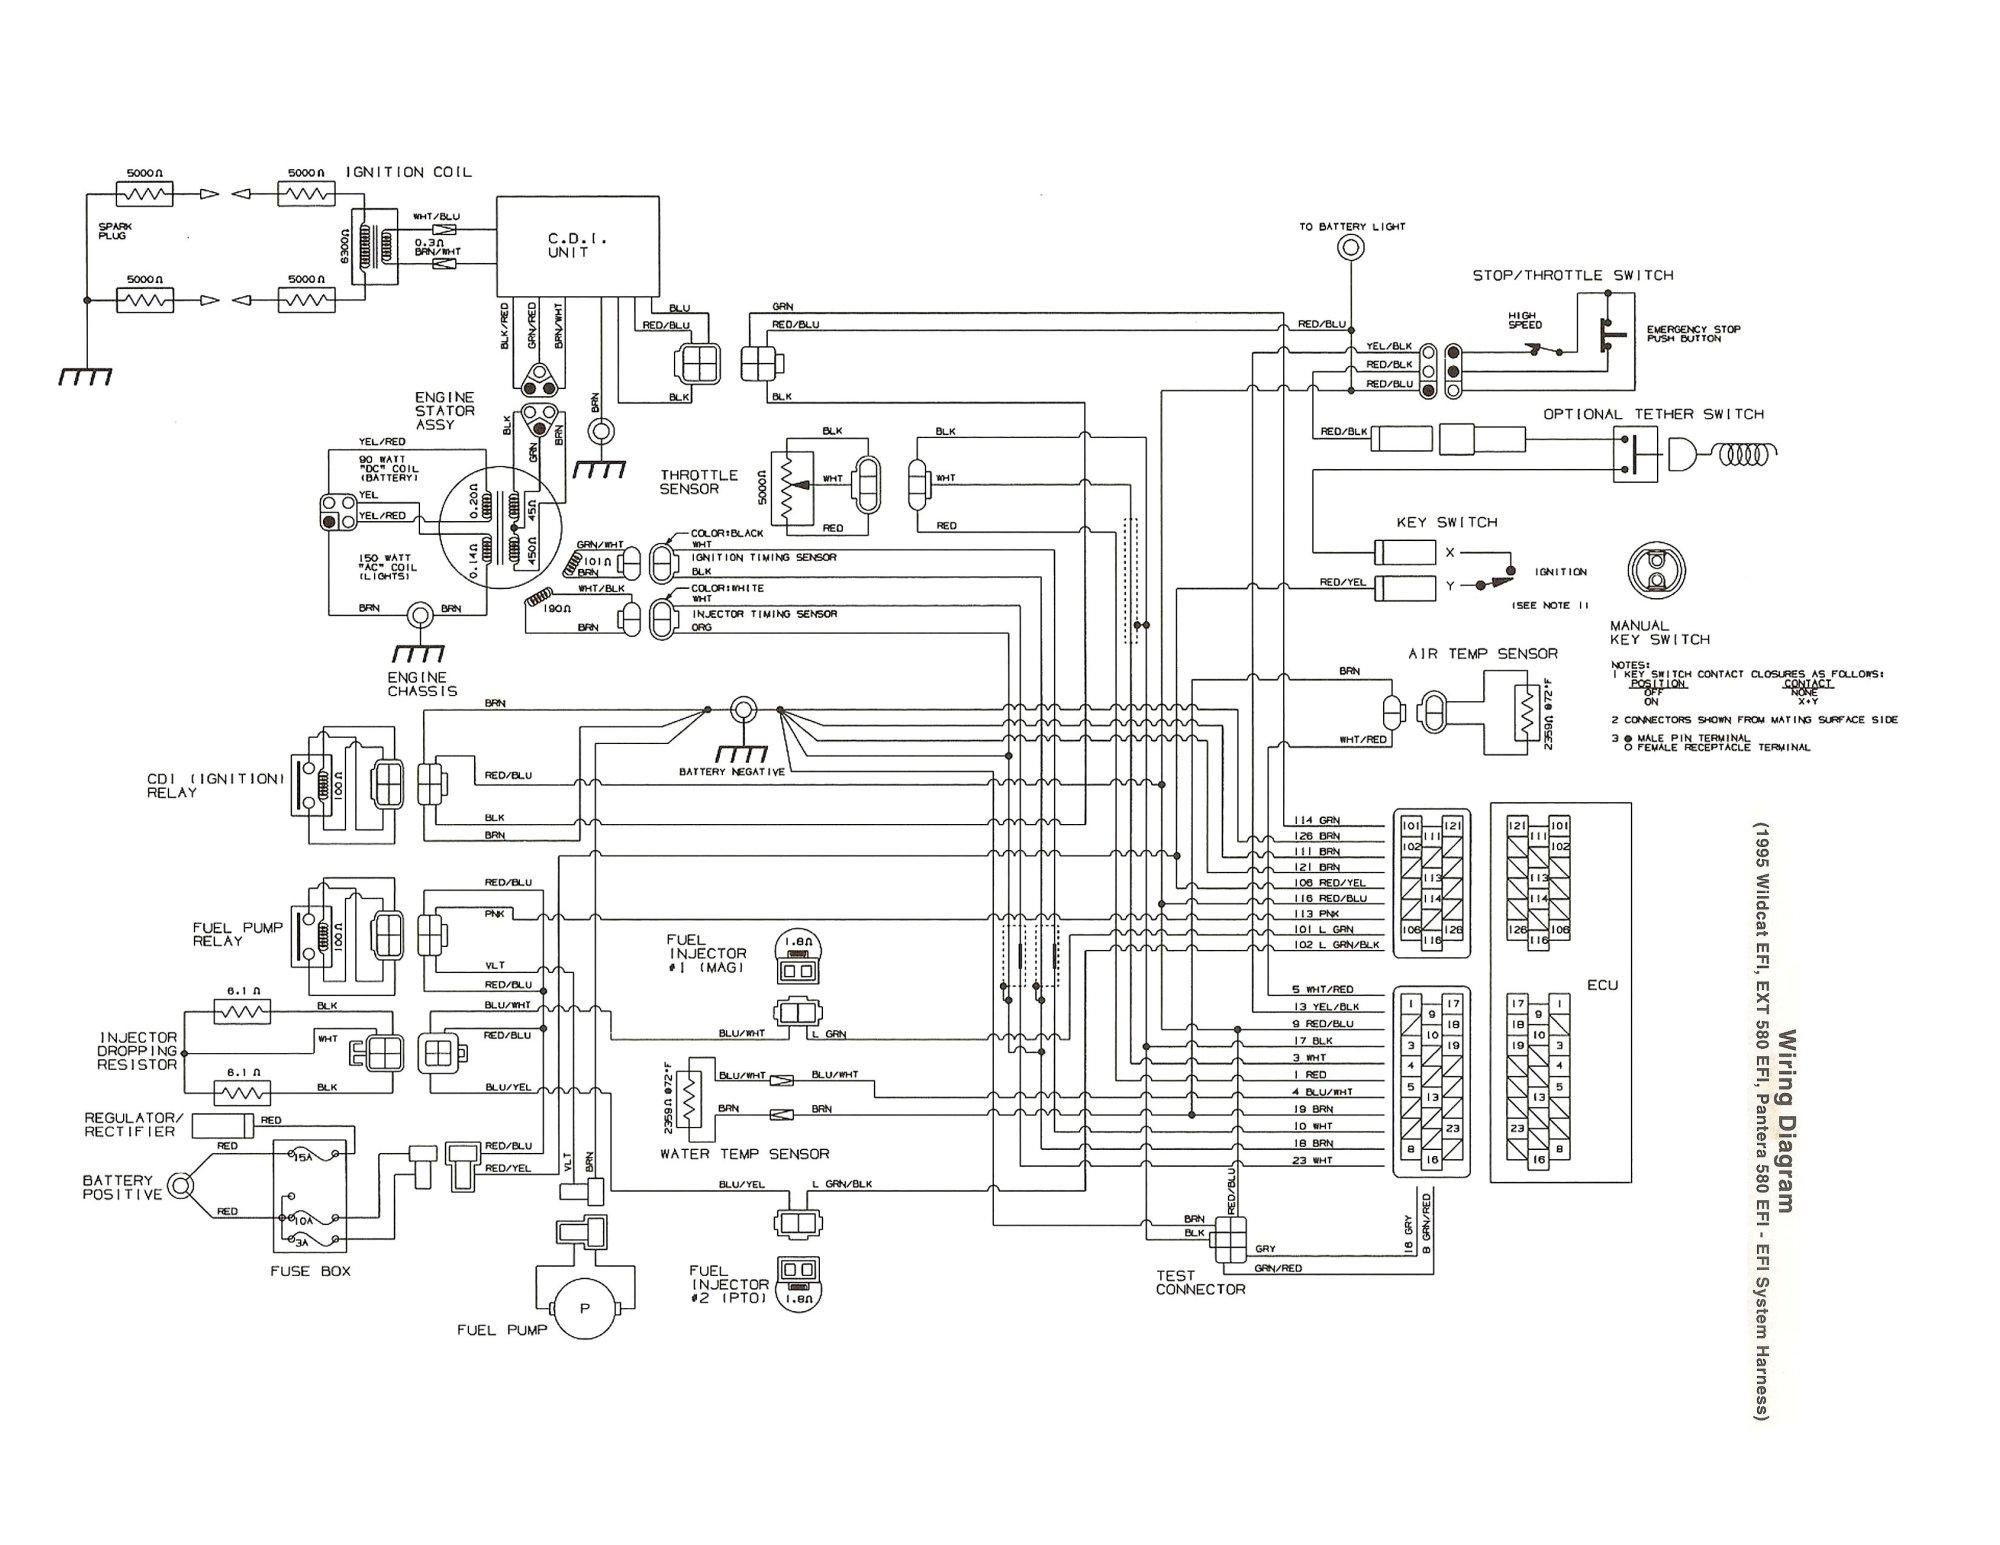 hight resolution of arctic cat 580 efi wiring diagram wiring diagrams arctic cat 300 wiring diagram 1996 arctic cat